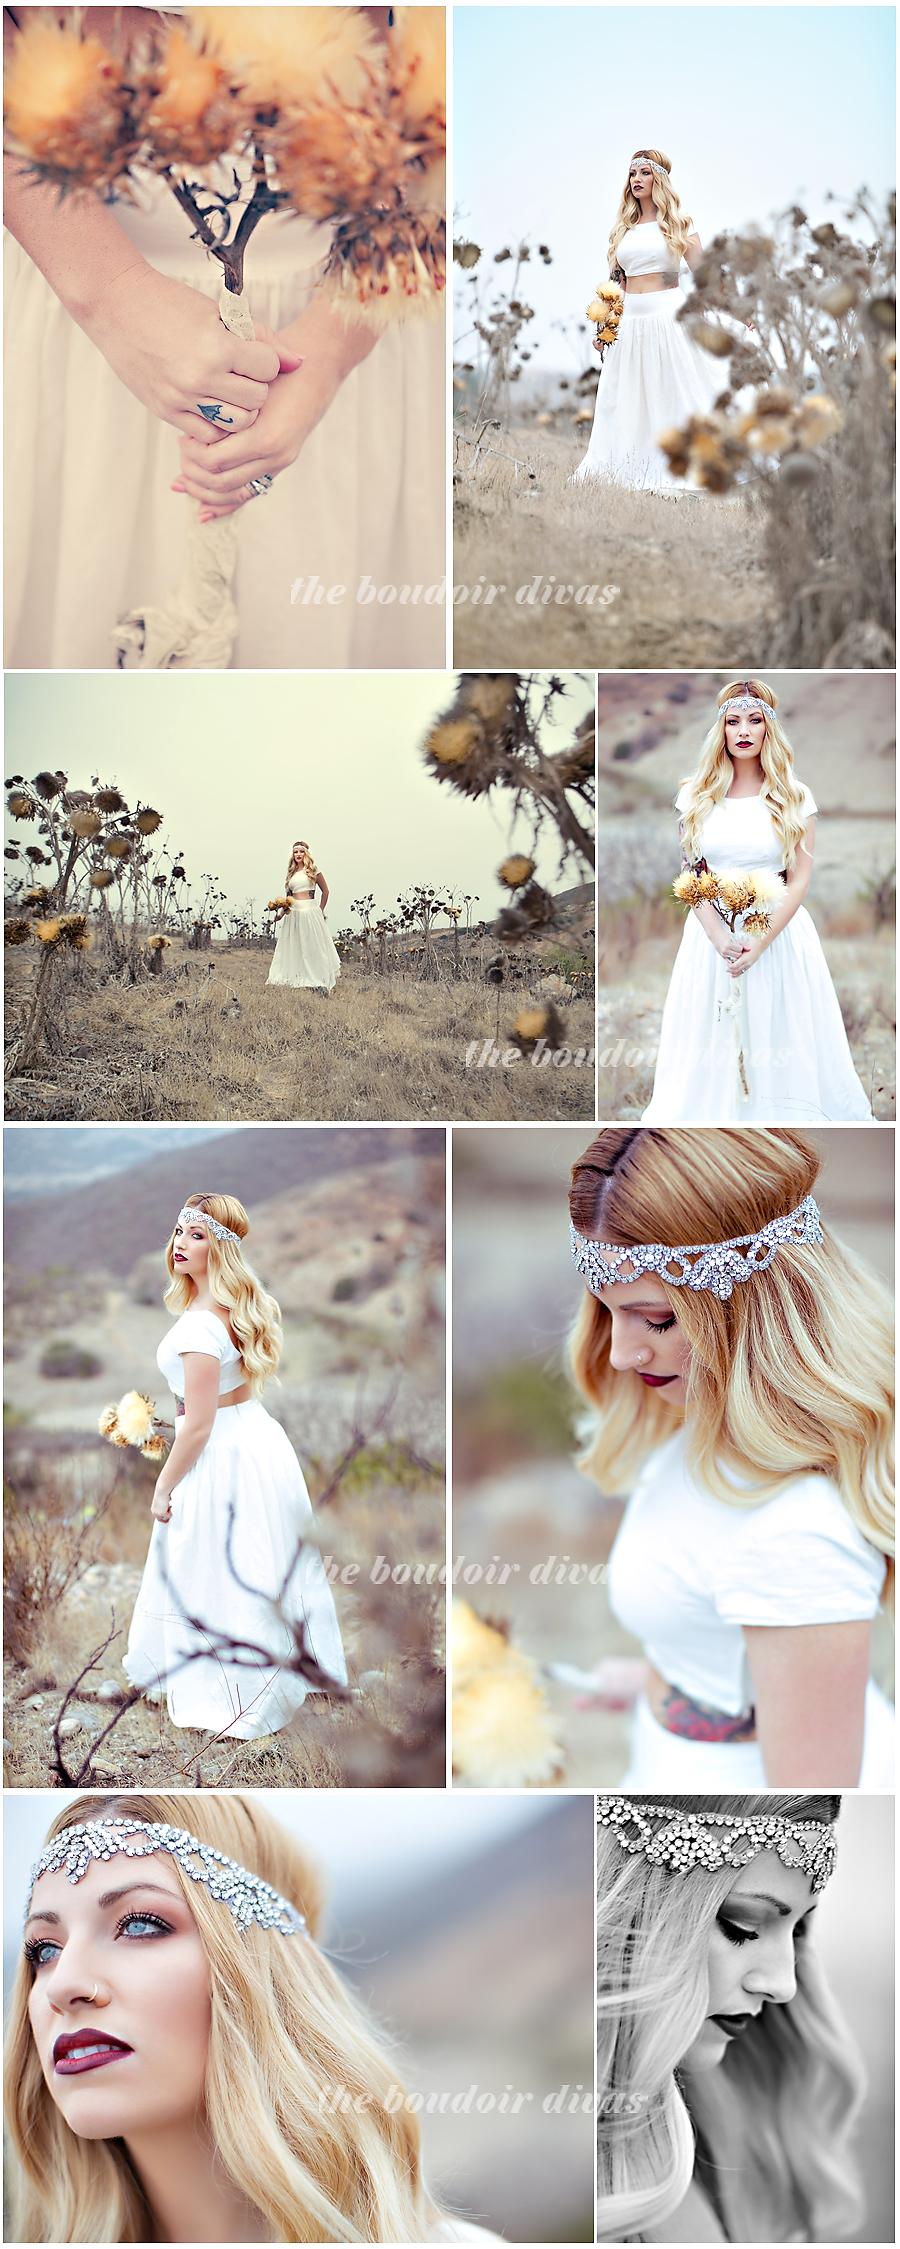 boudoir-divas-outdoor-shoot-bridal-vintage-fall